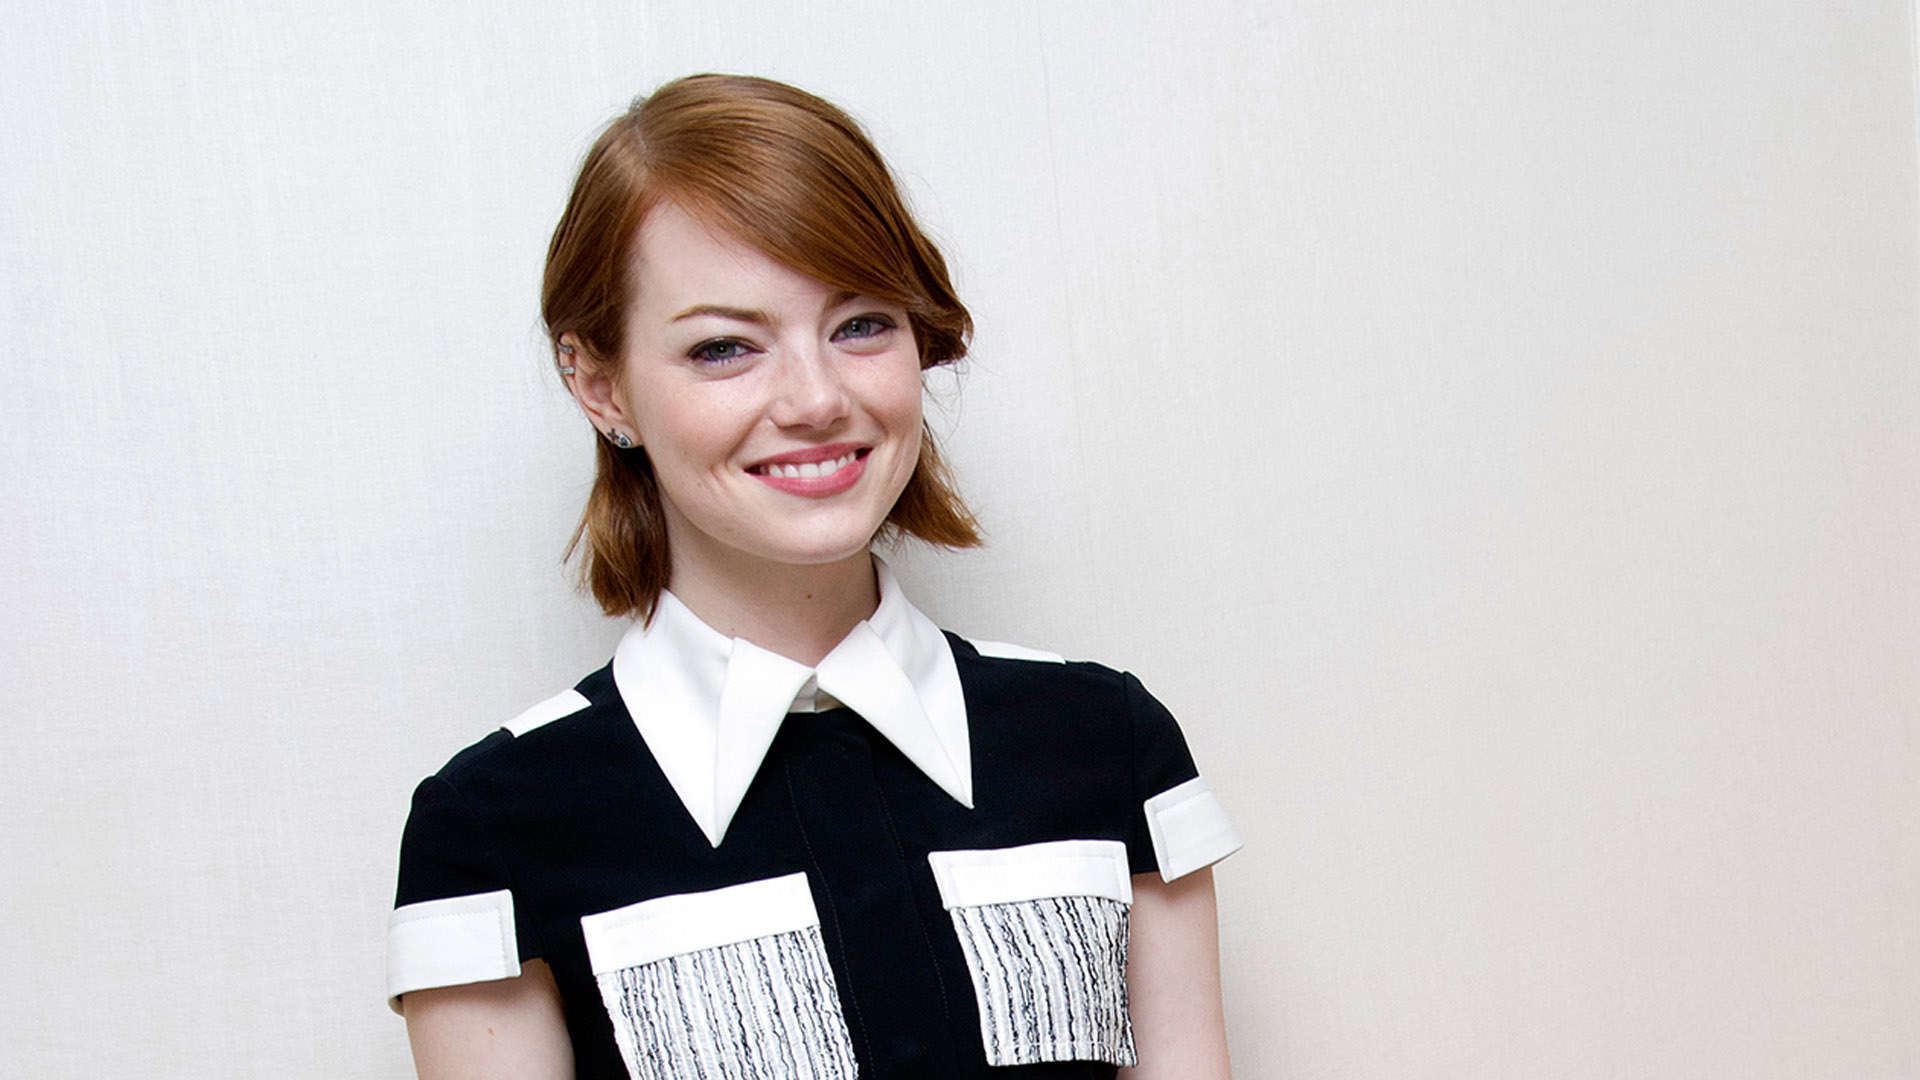 Emma Stone Smile Wallpaper 61005